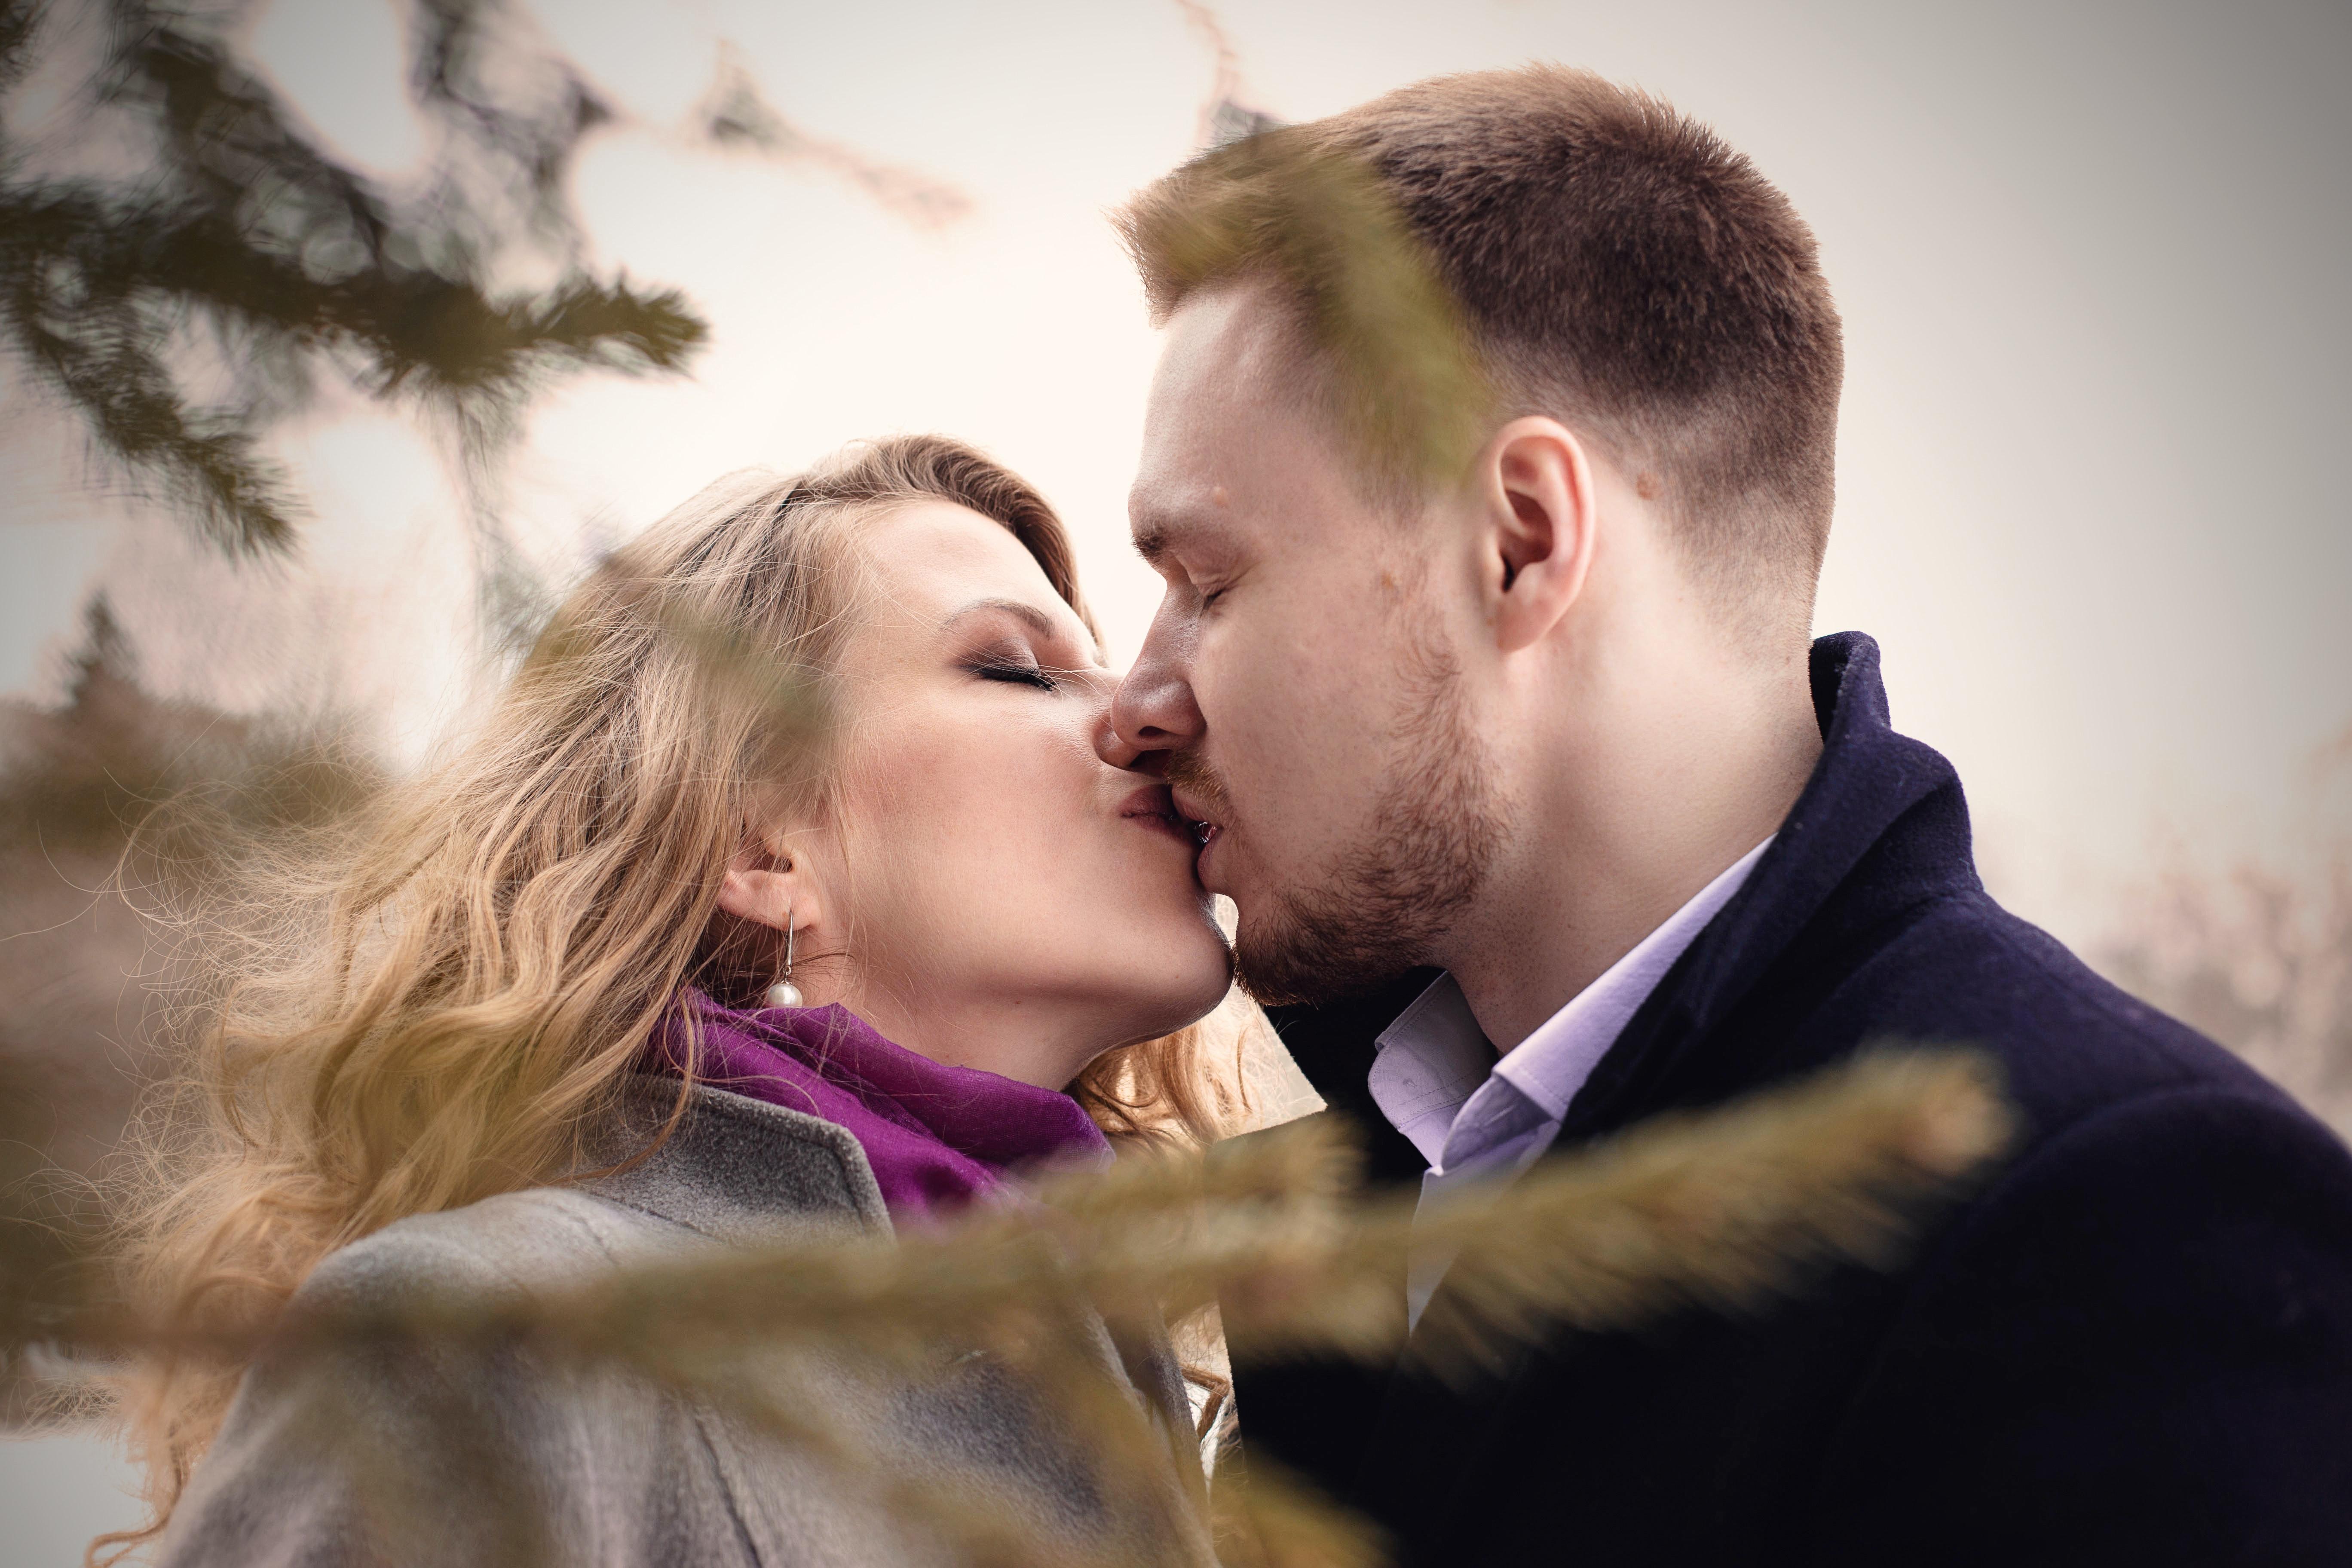 kiss and romance